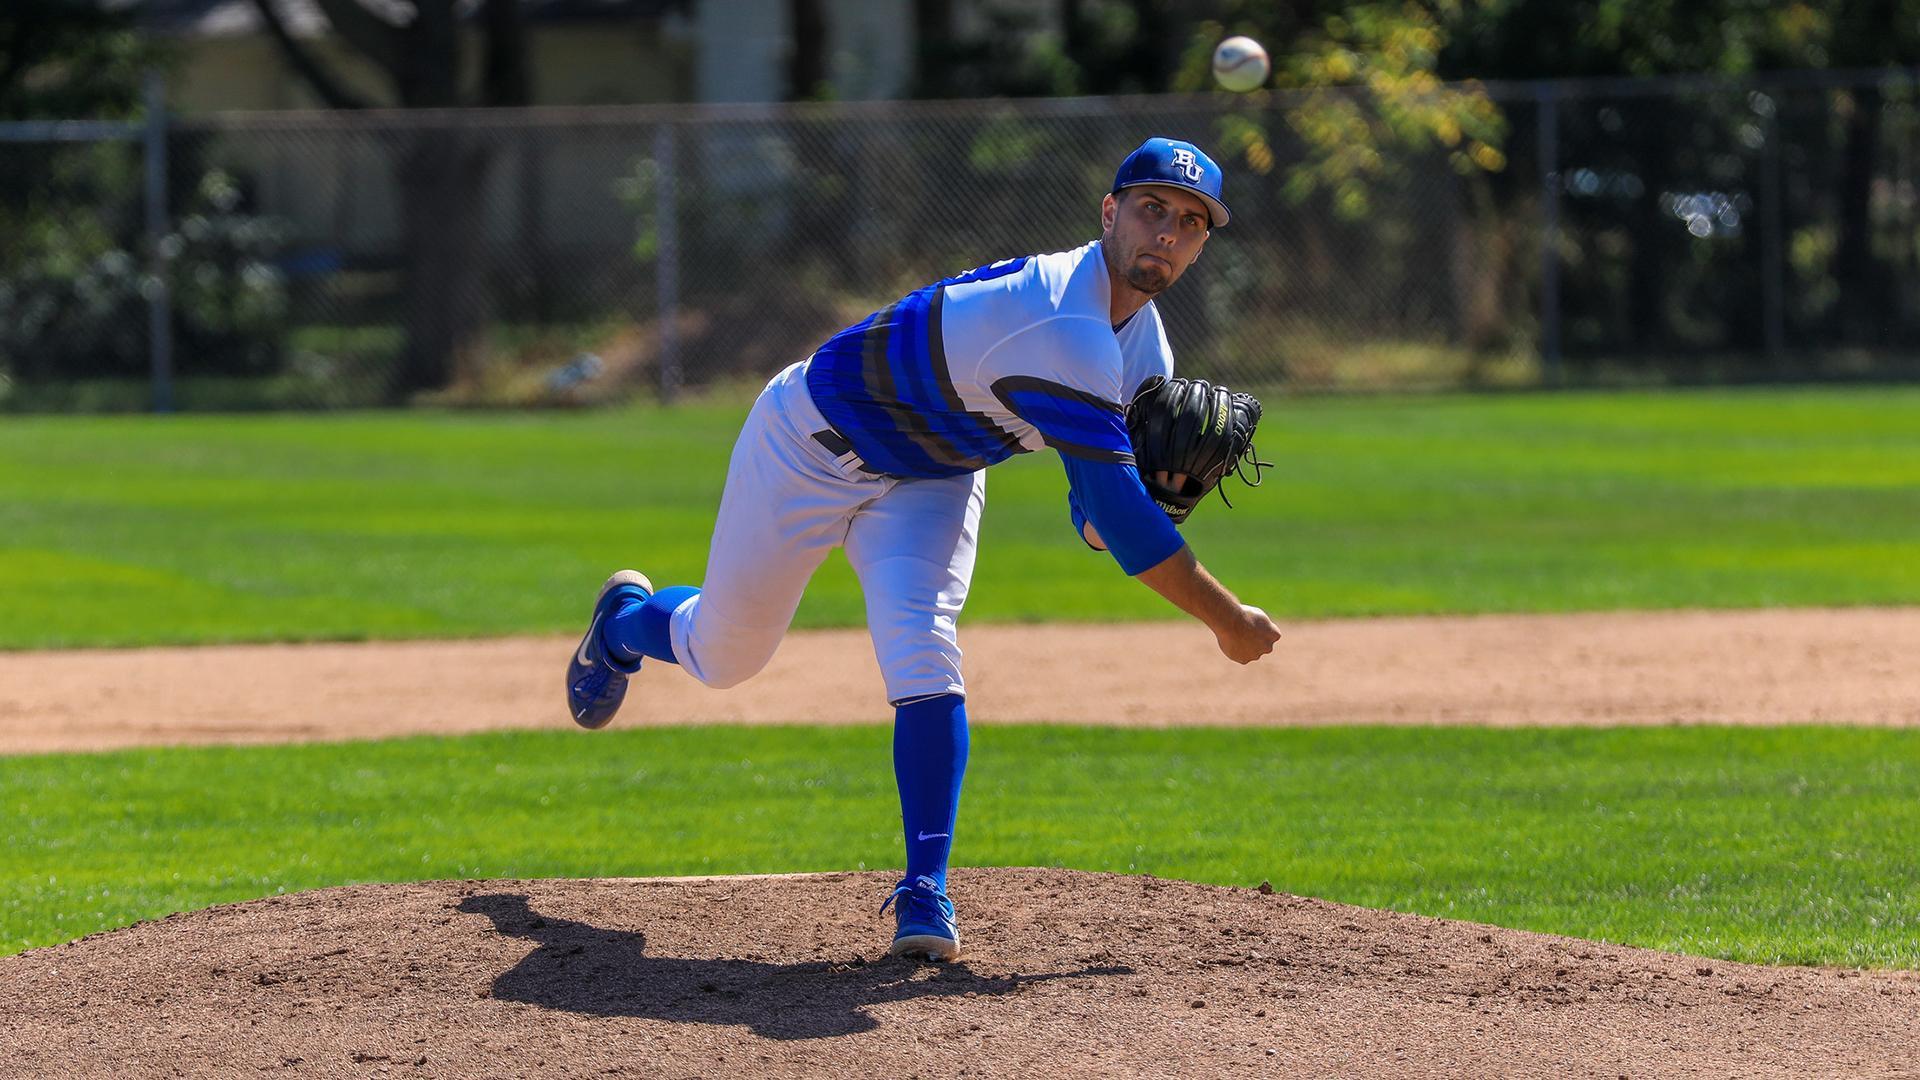 Iusb Spring 2020 Calendar.2020 Baseball Bethel University Athletics